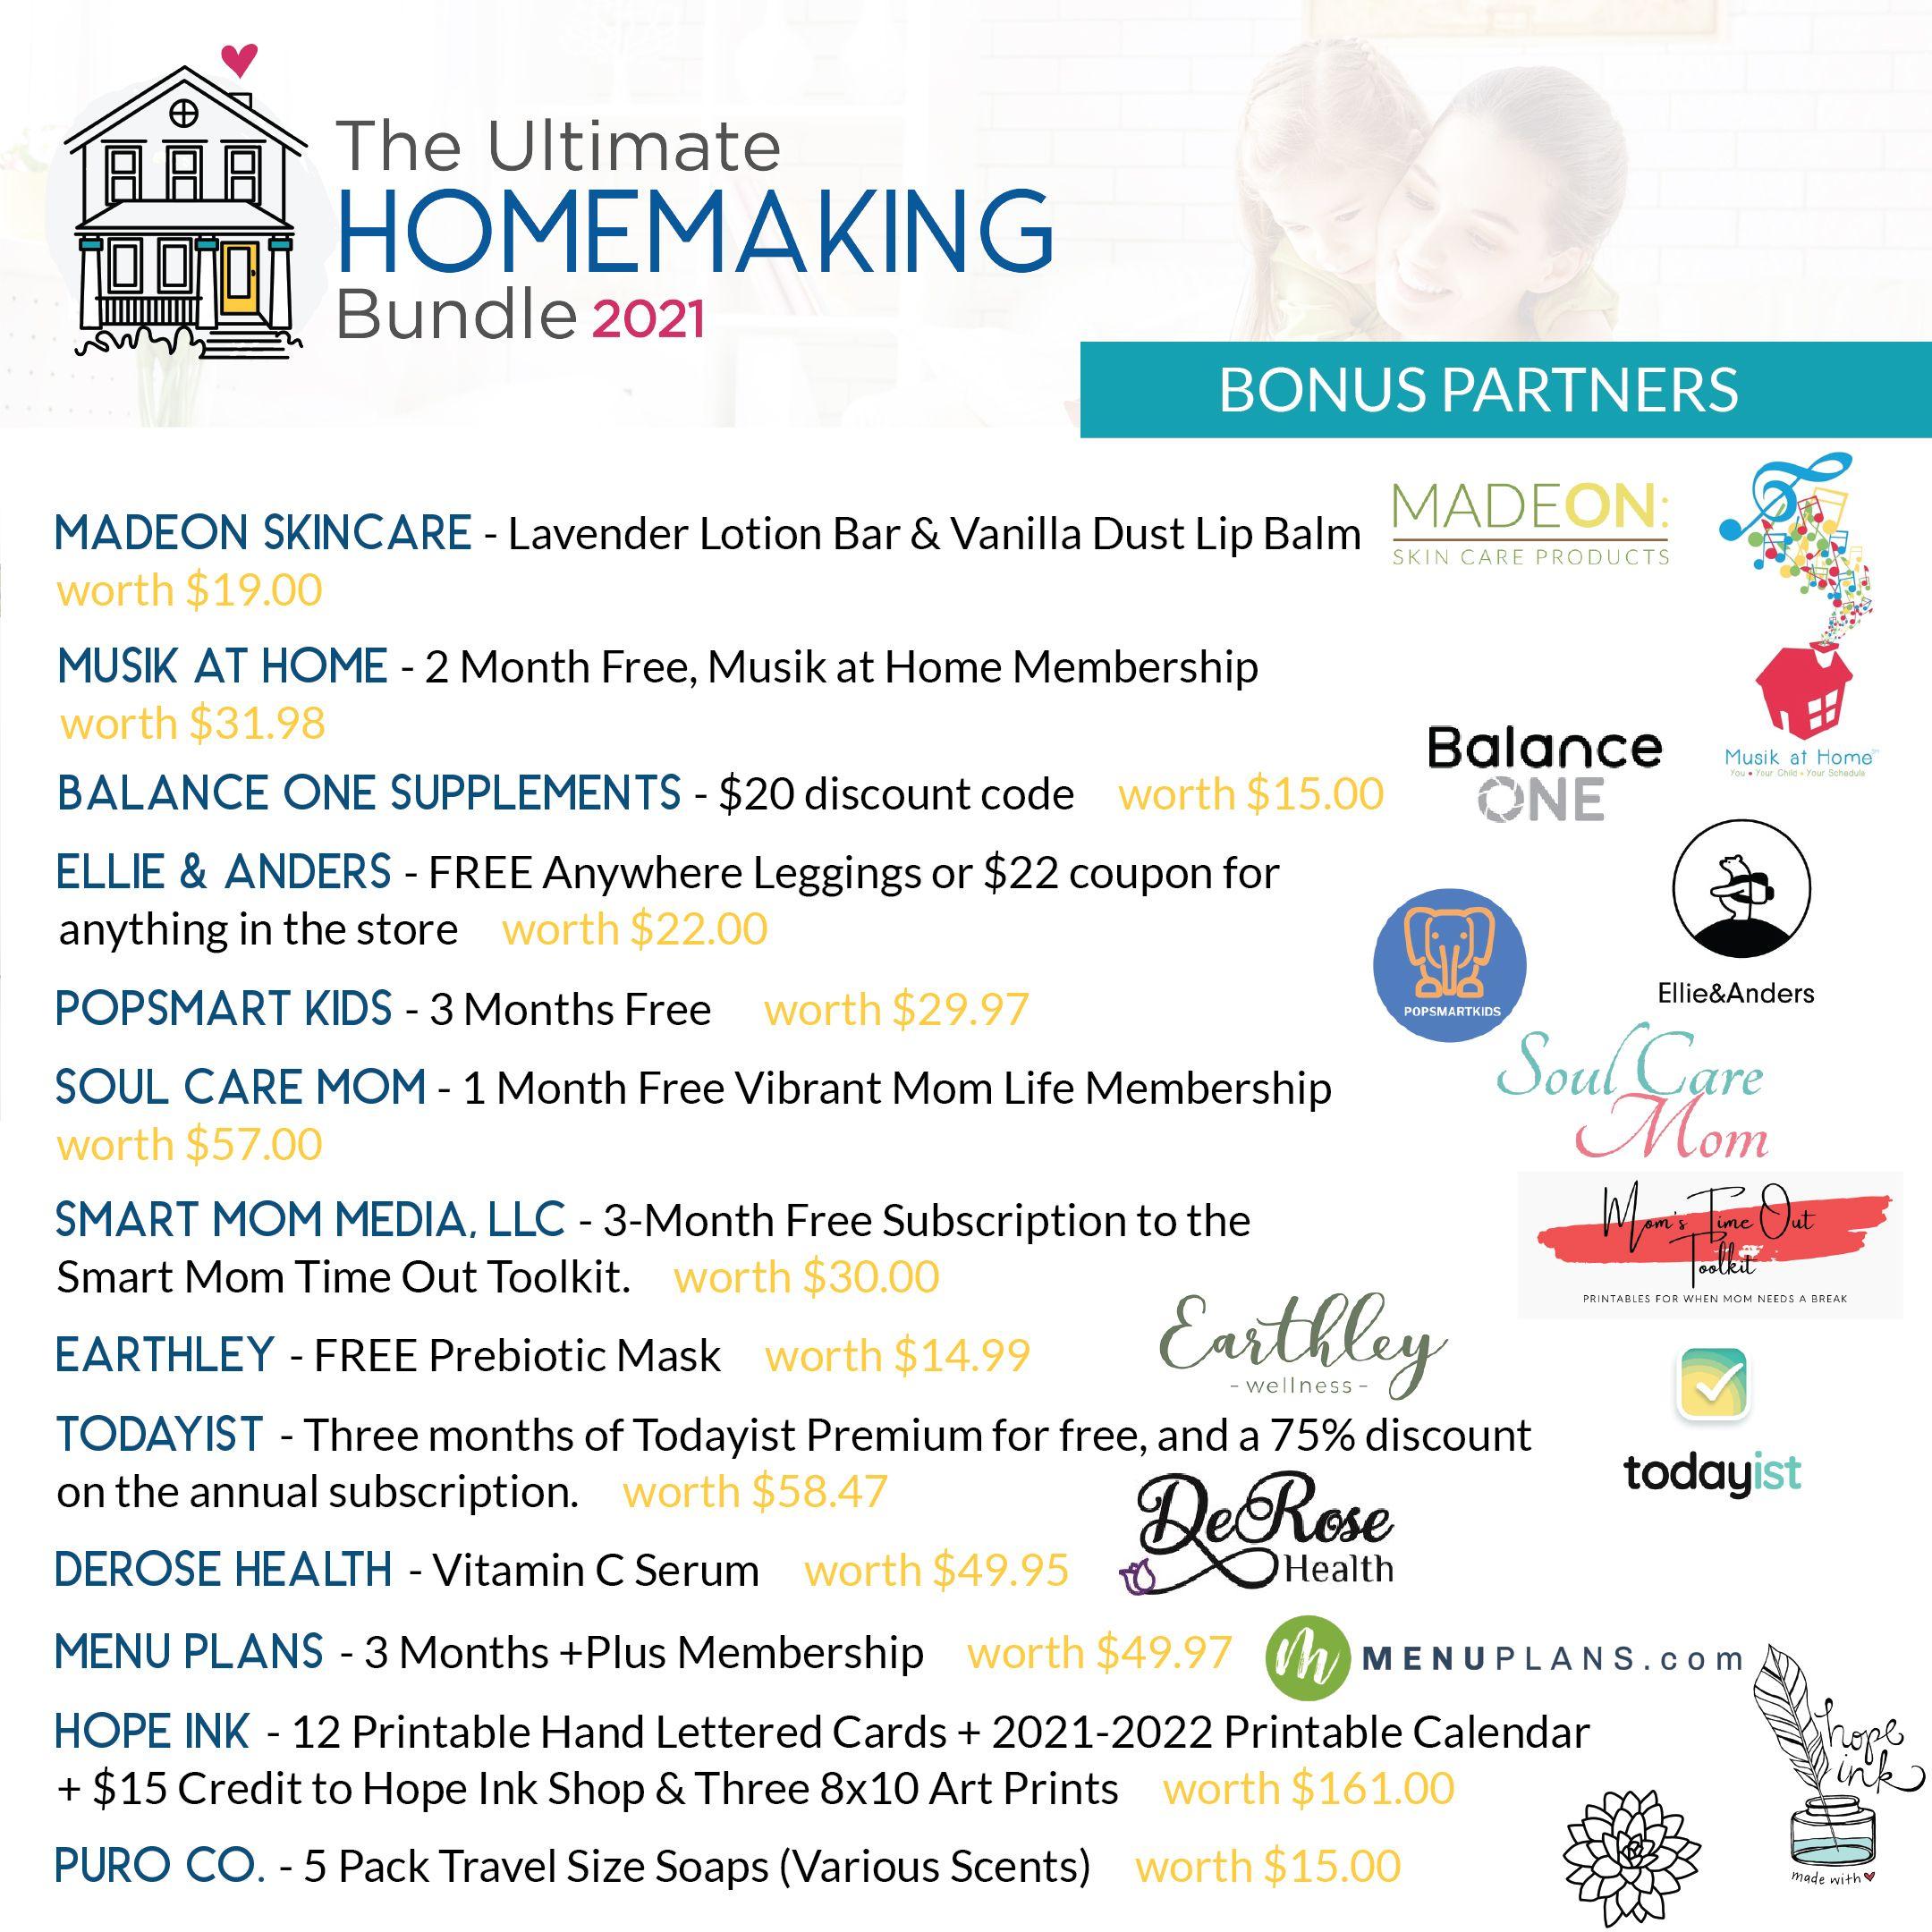 Bonus partners for the 2021 Ultimate Homemaking Bundle